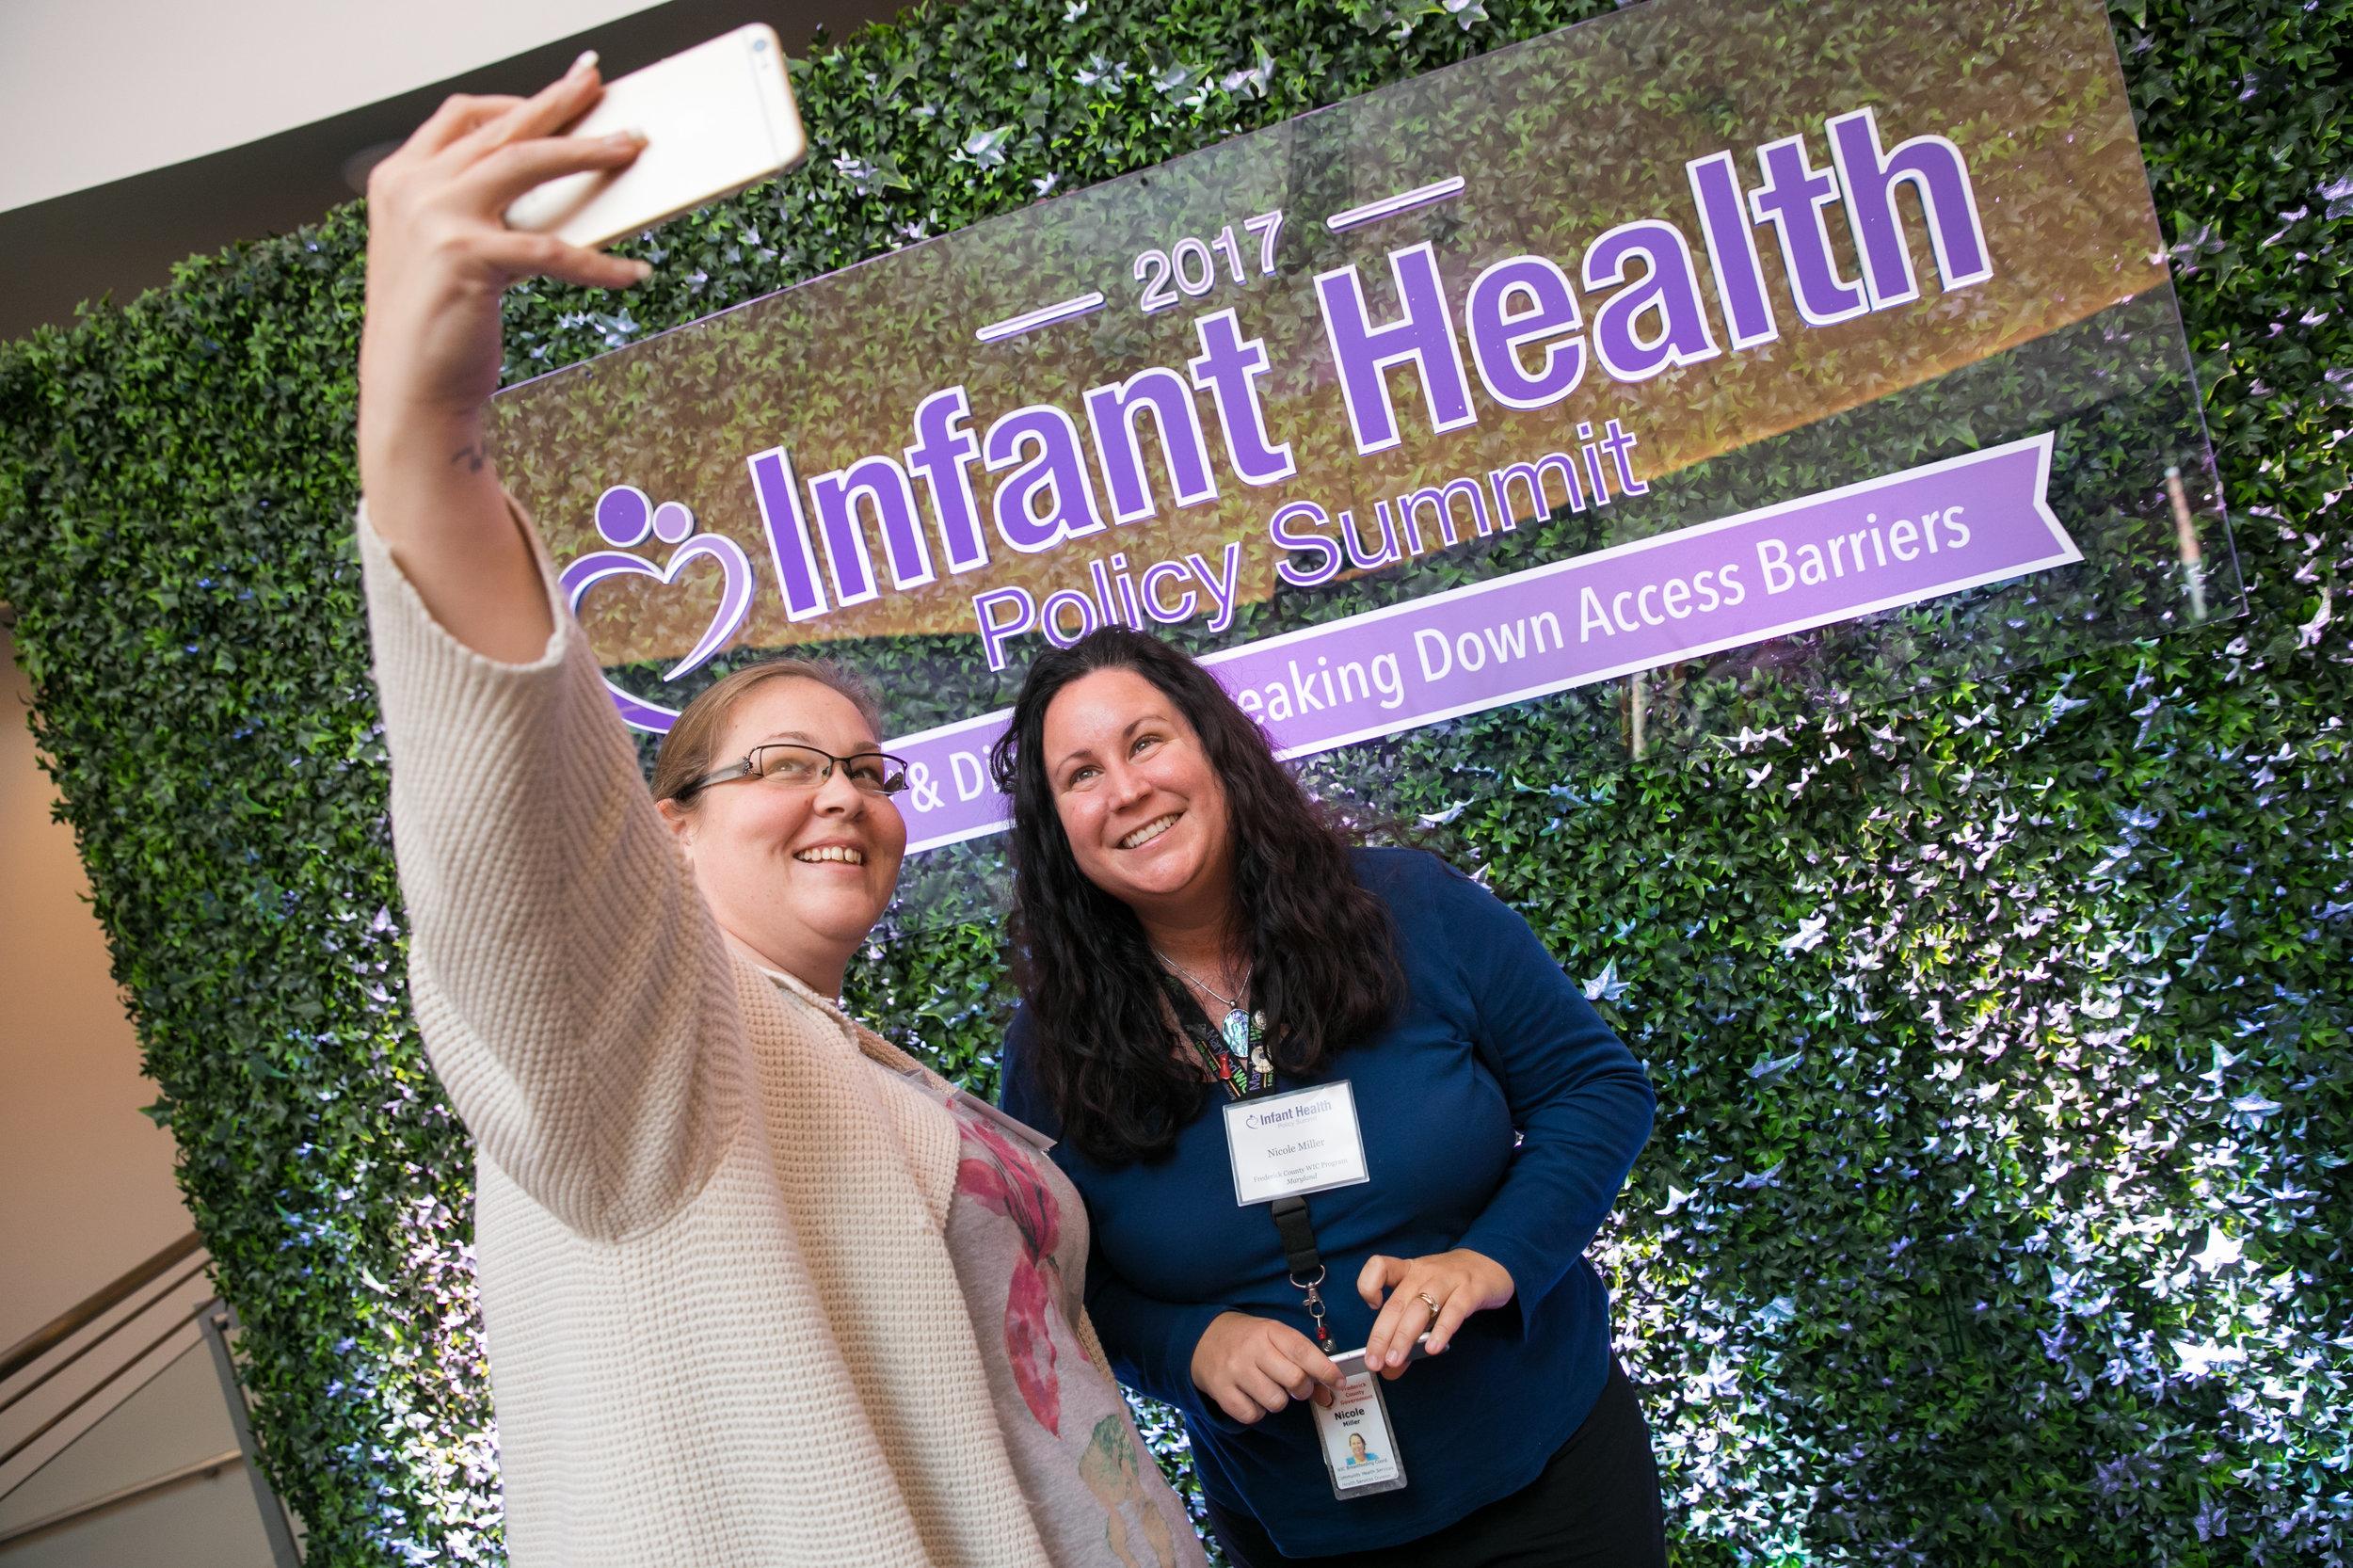 Infant Health Policy Summit - Jason Dixson Photography - 102024 - 0352.jpg